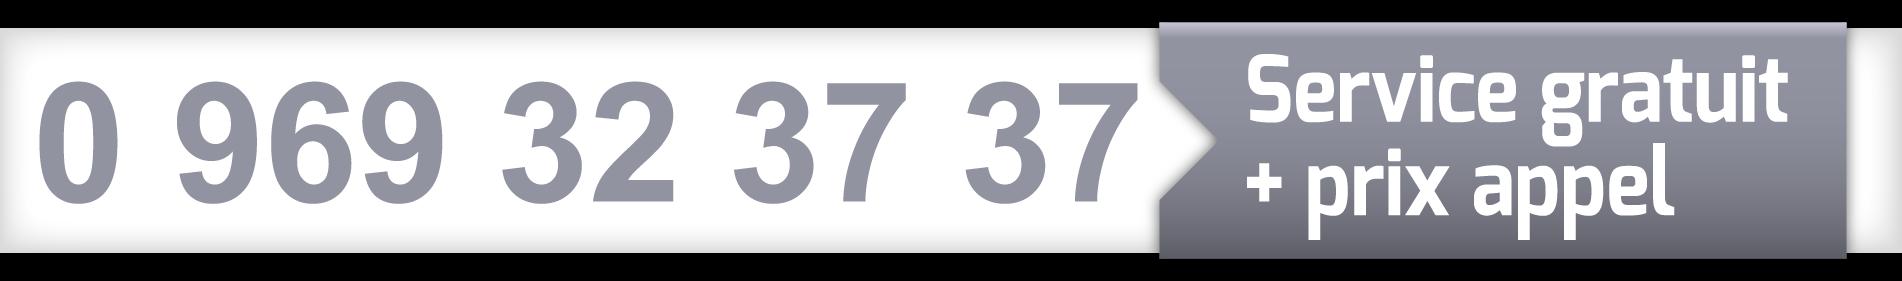 09 69 32 37 37